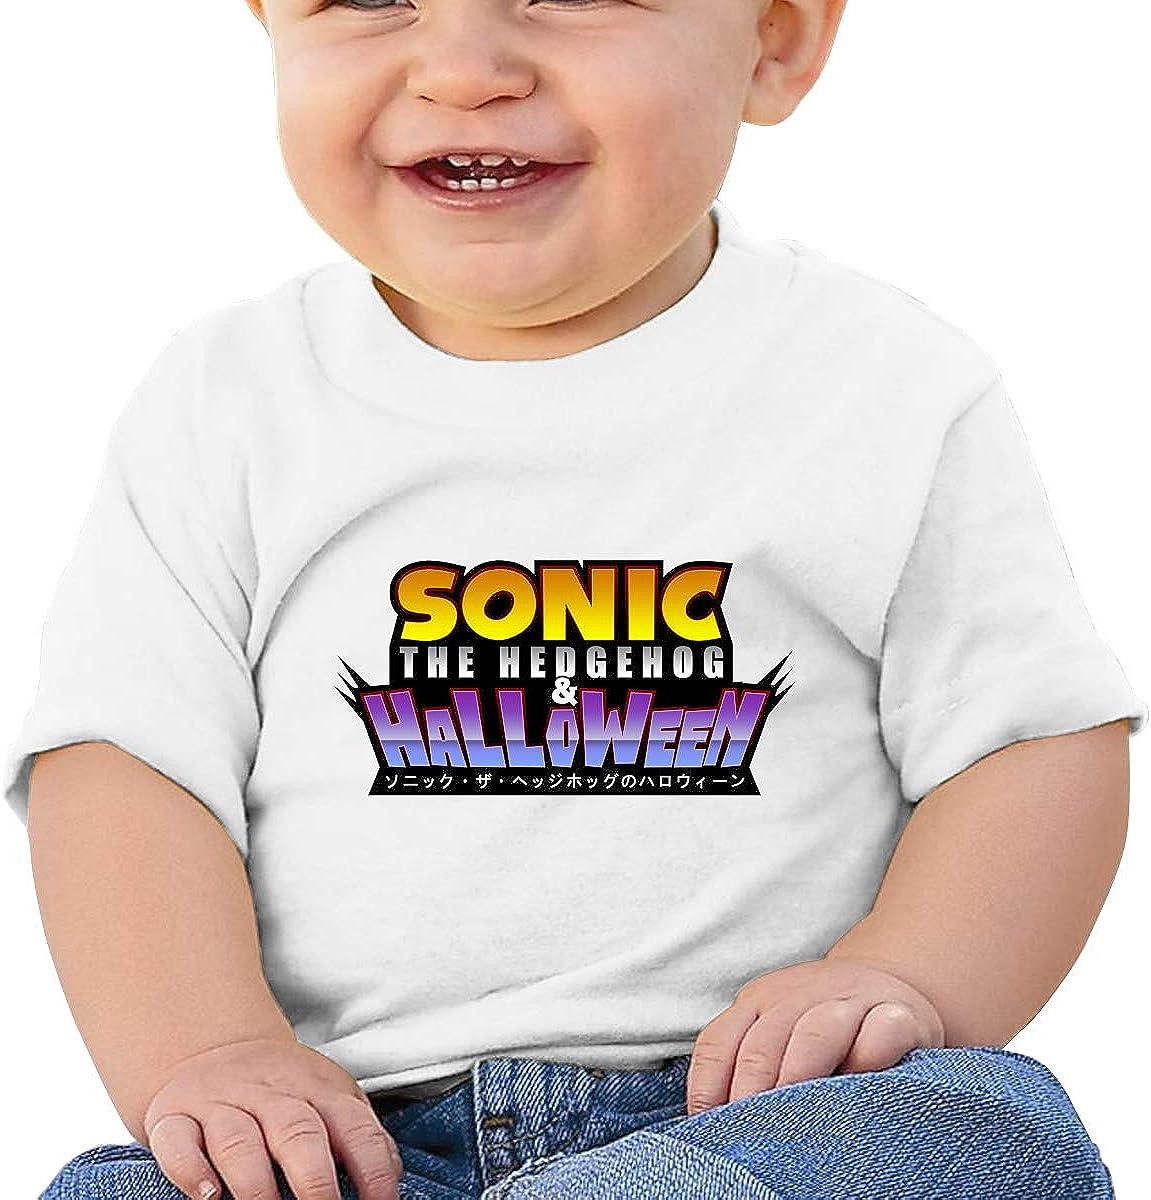 Zippem Sonic Short Sleeve T-Shirt Best for Baby Toddler//Infant Kids T-Shirt Close Skin Soft